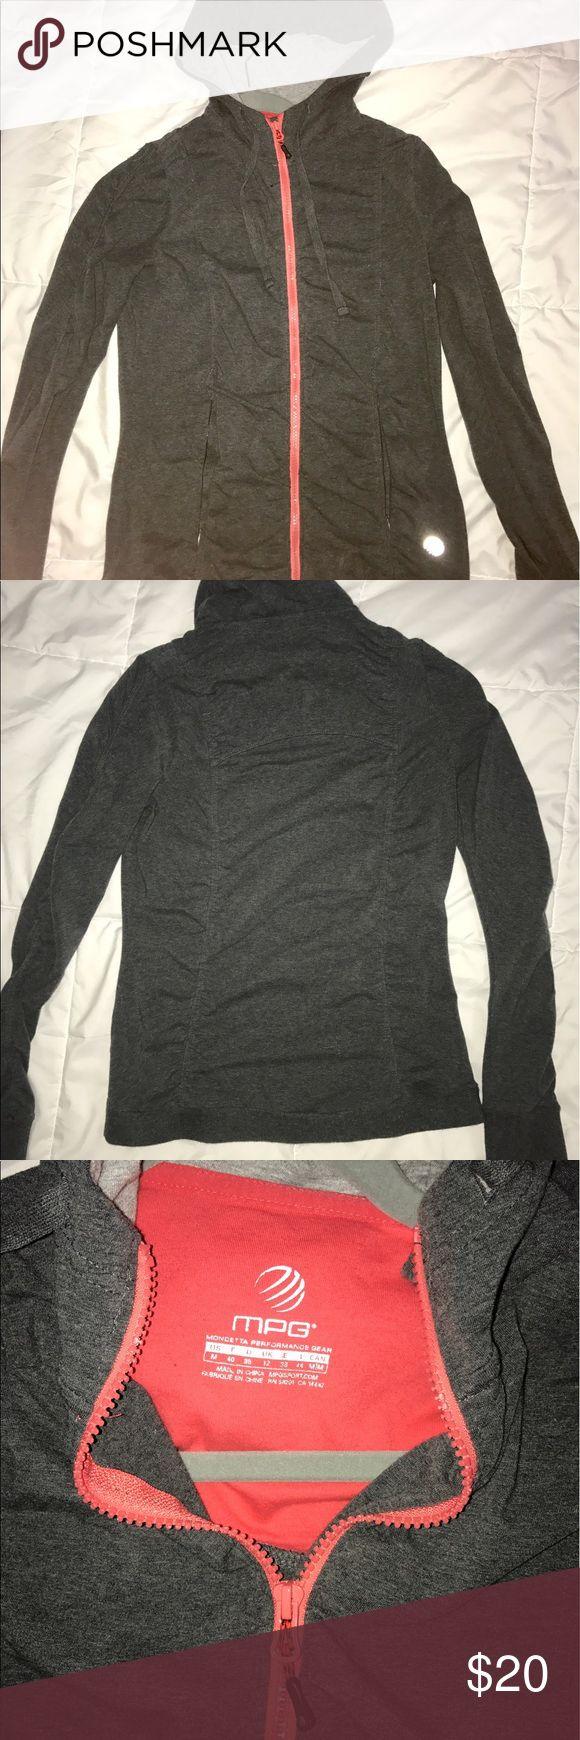 MPG athleisure jacket MPG athletic full zip hoodie, form fitting MPG Jackets & Coats